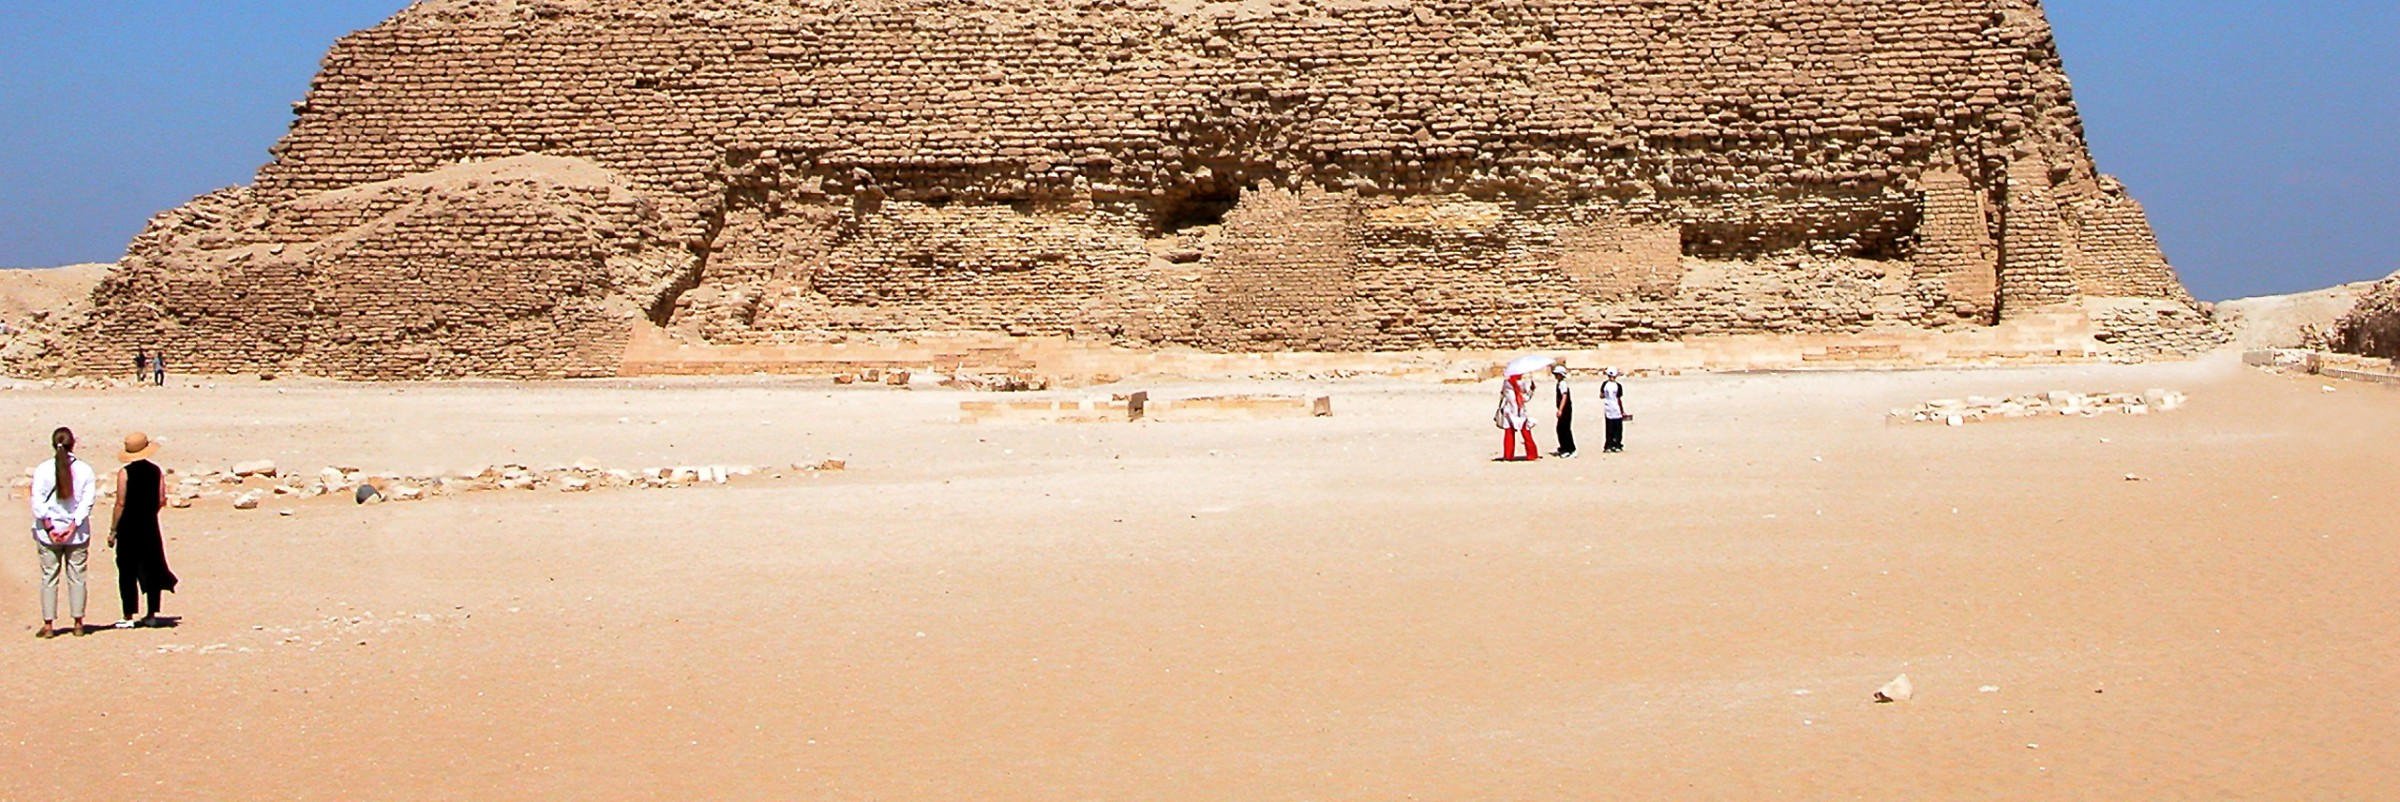 Pyramid of Djoser Saqqara Necropolis, Egypt